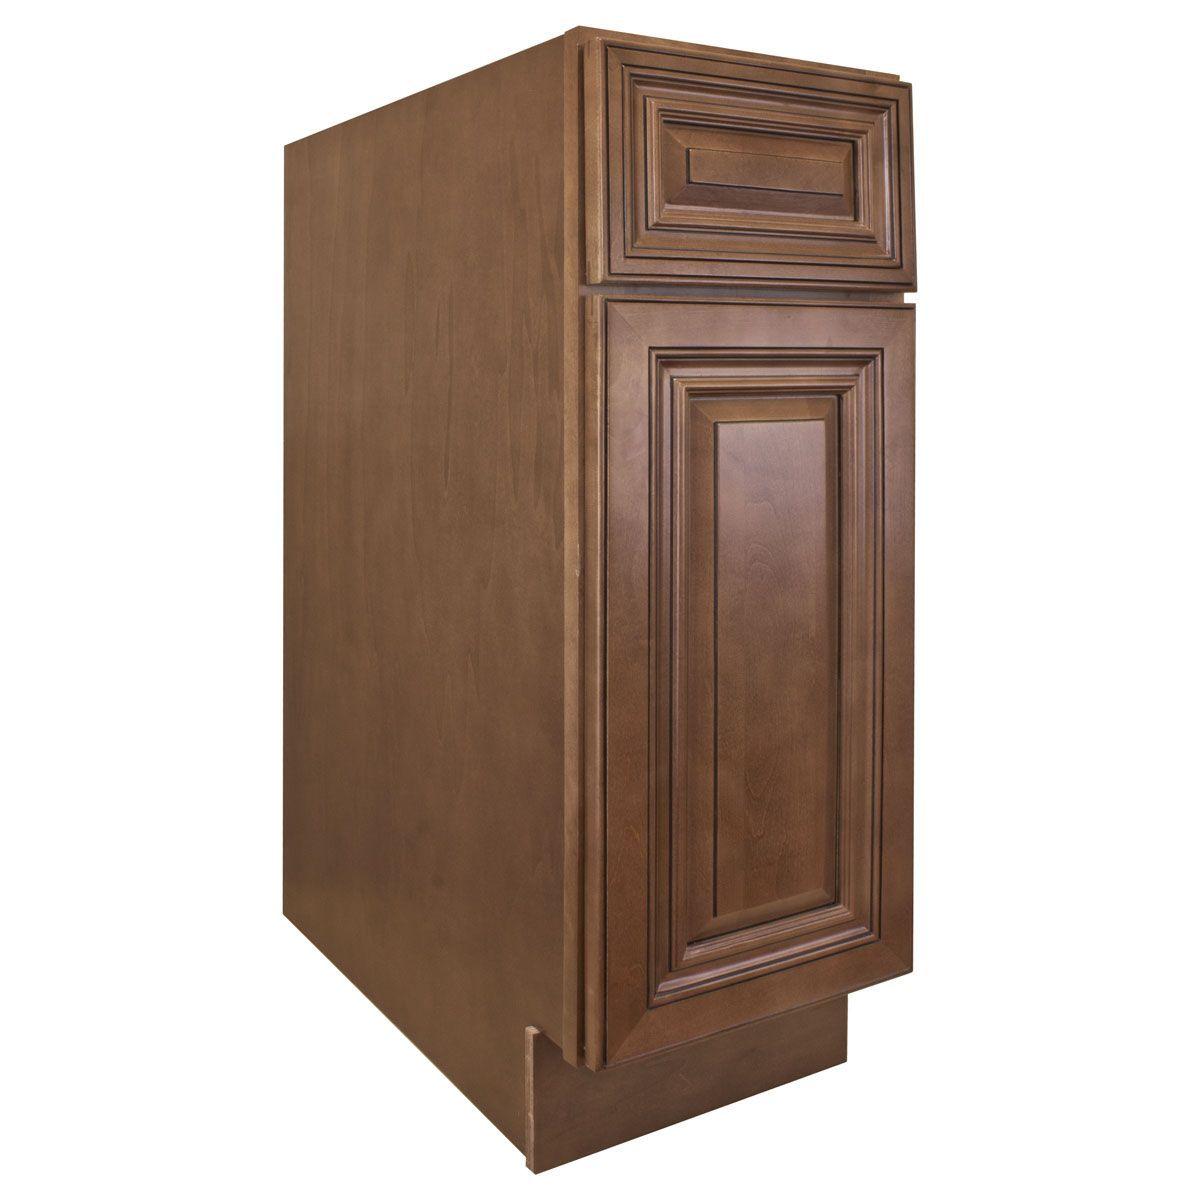 LessCare Geneva Cabinets - Kitchen Cabinets - Kitchen